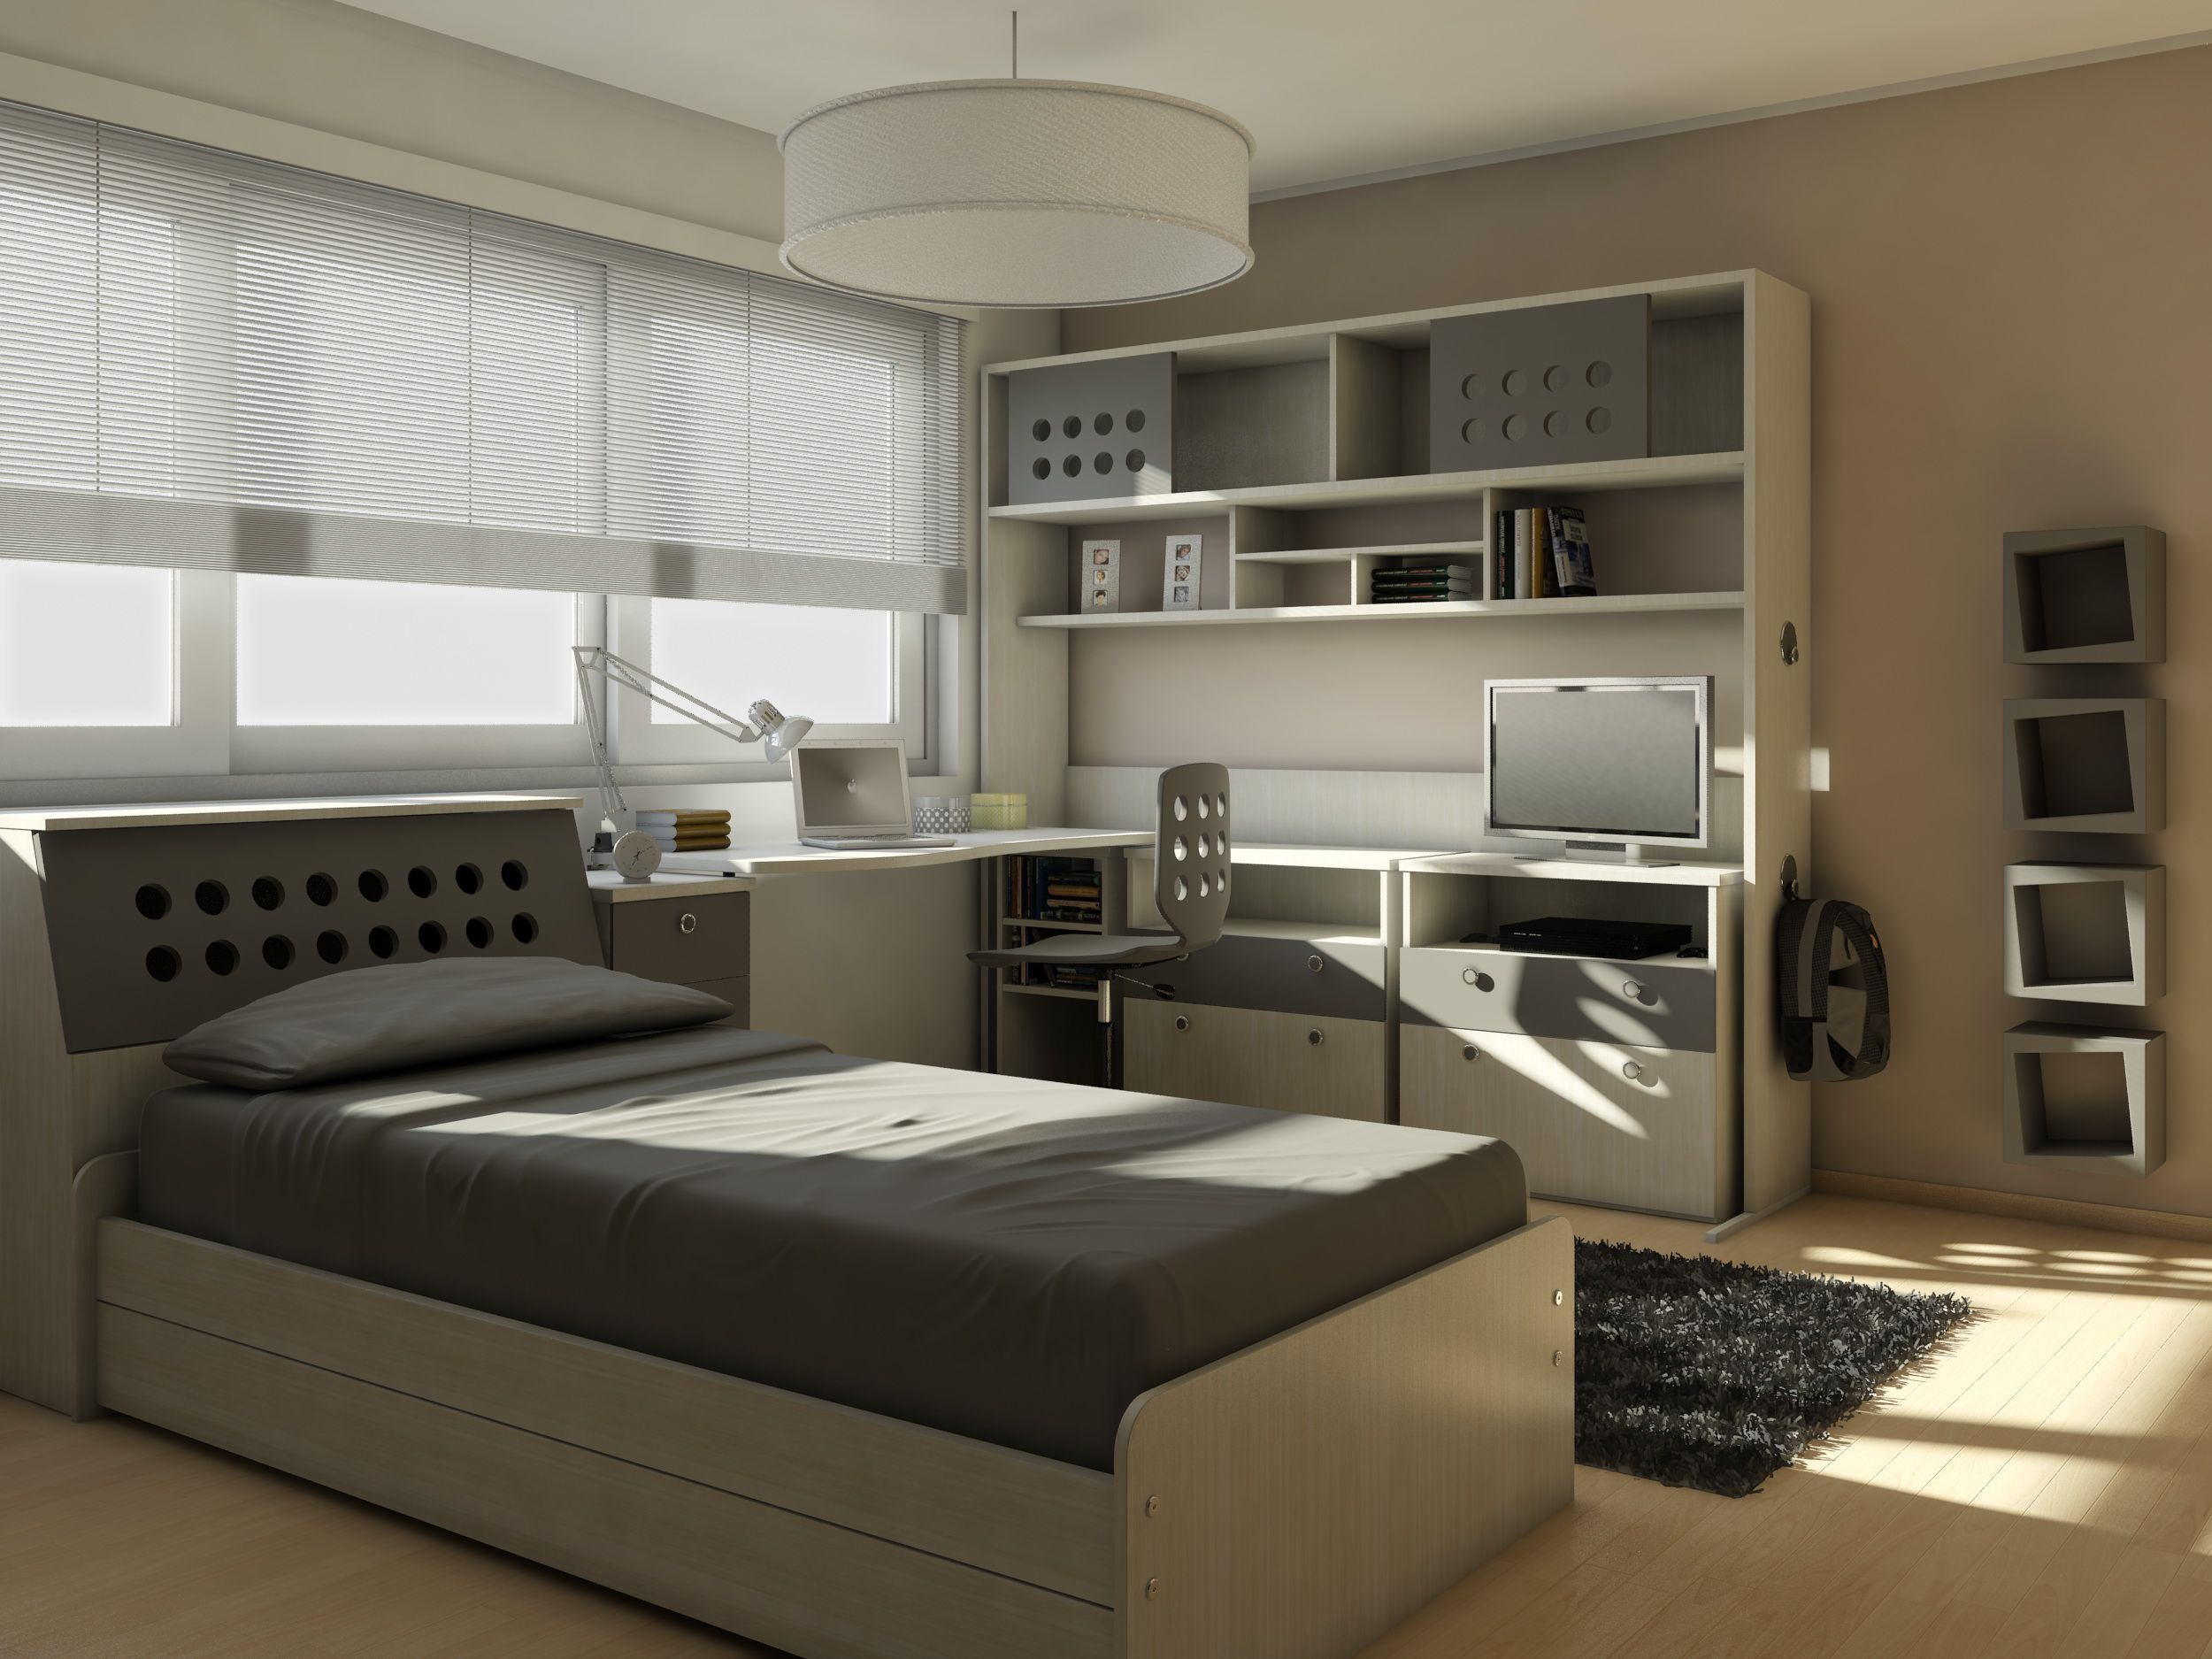 Dormitorios Juveniles Modernos Para Varones